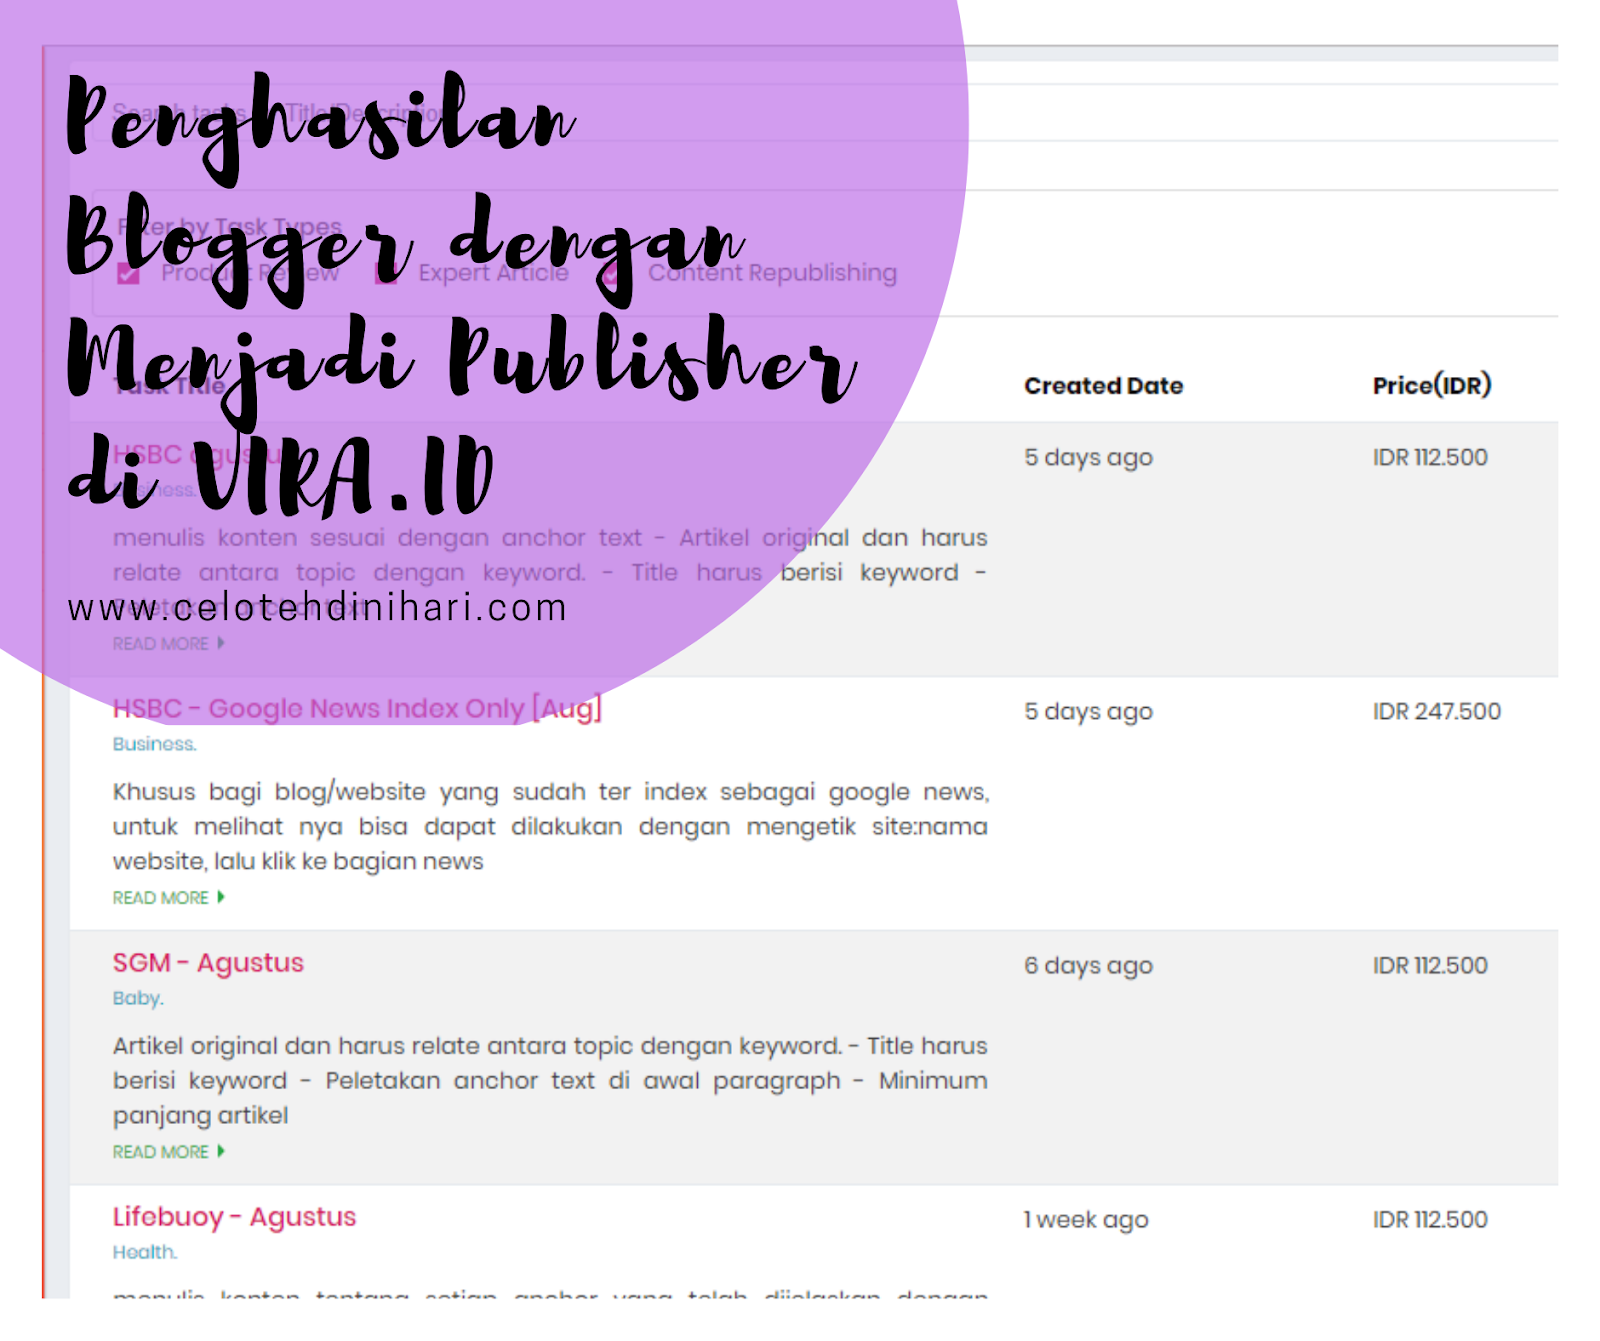 penghasilan blogger dari VIRA.ID